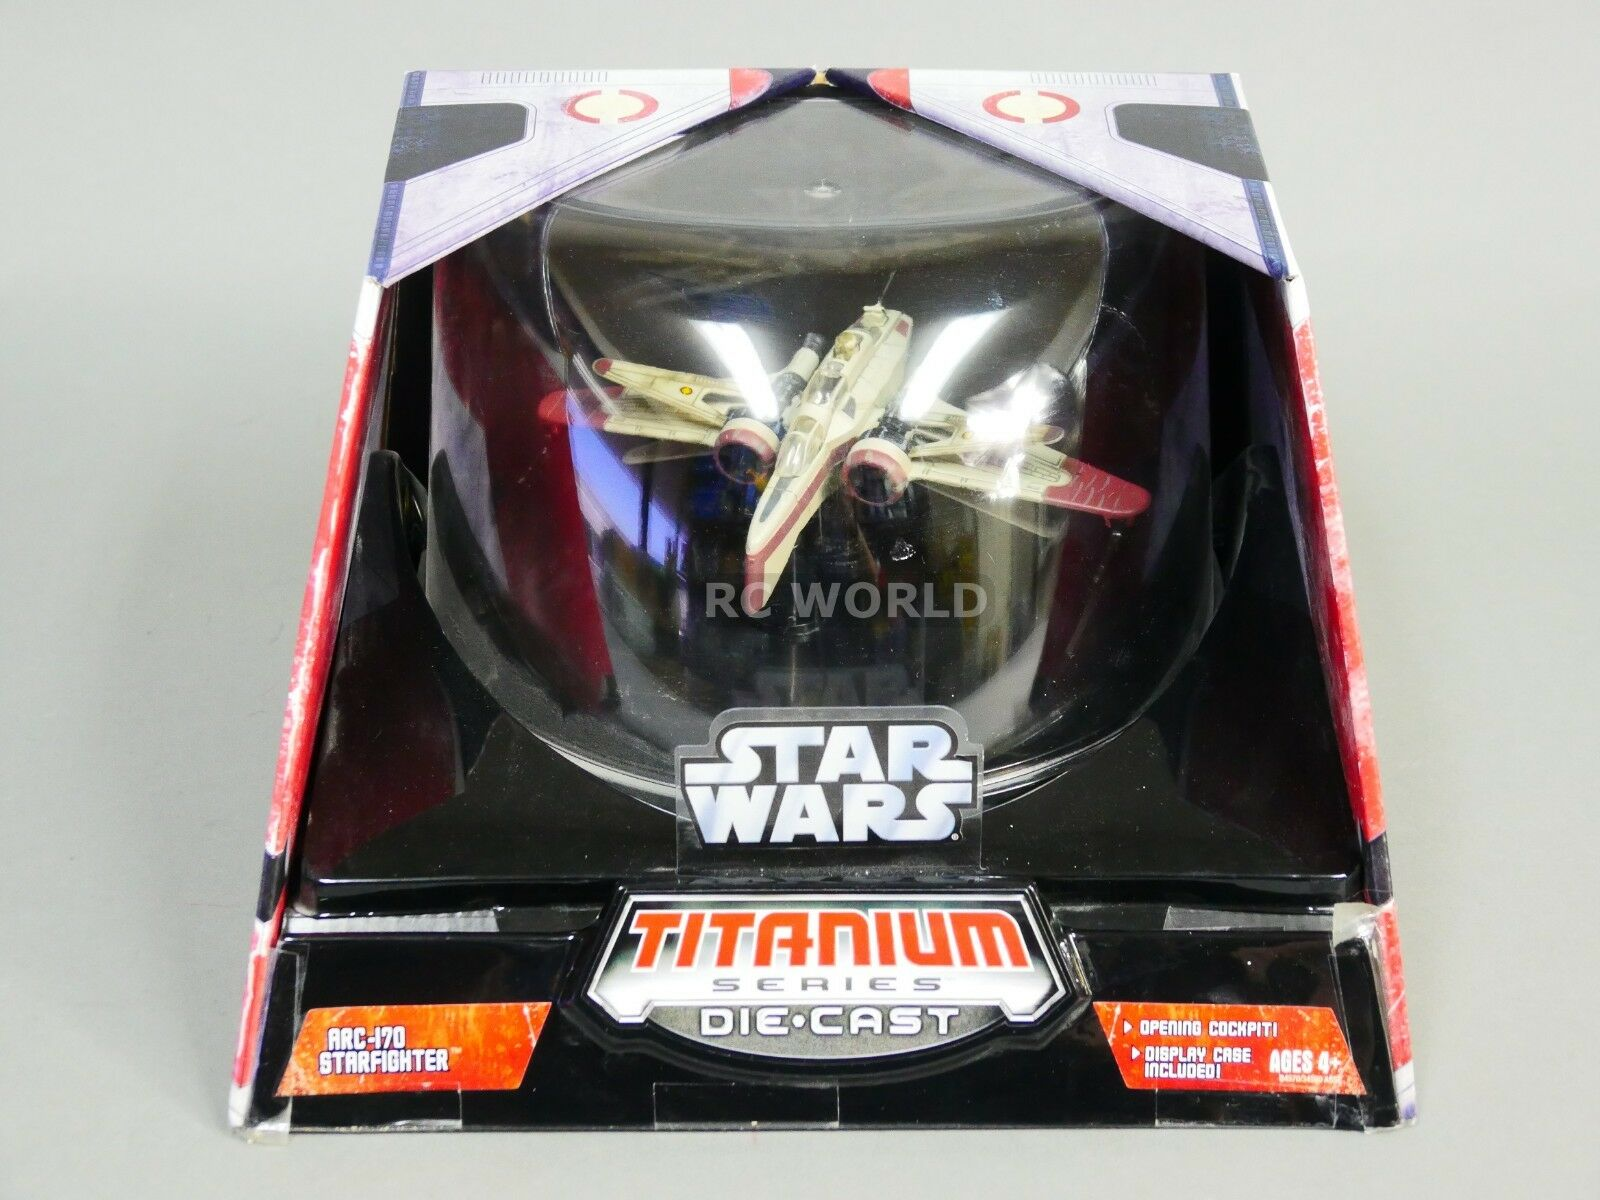 Star Wars Titanium Series ARC-170 STARFIGHTER Die-Cast Model  ob1